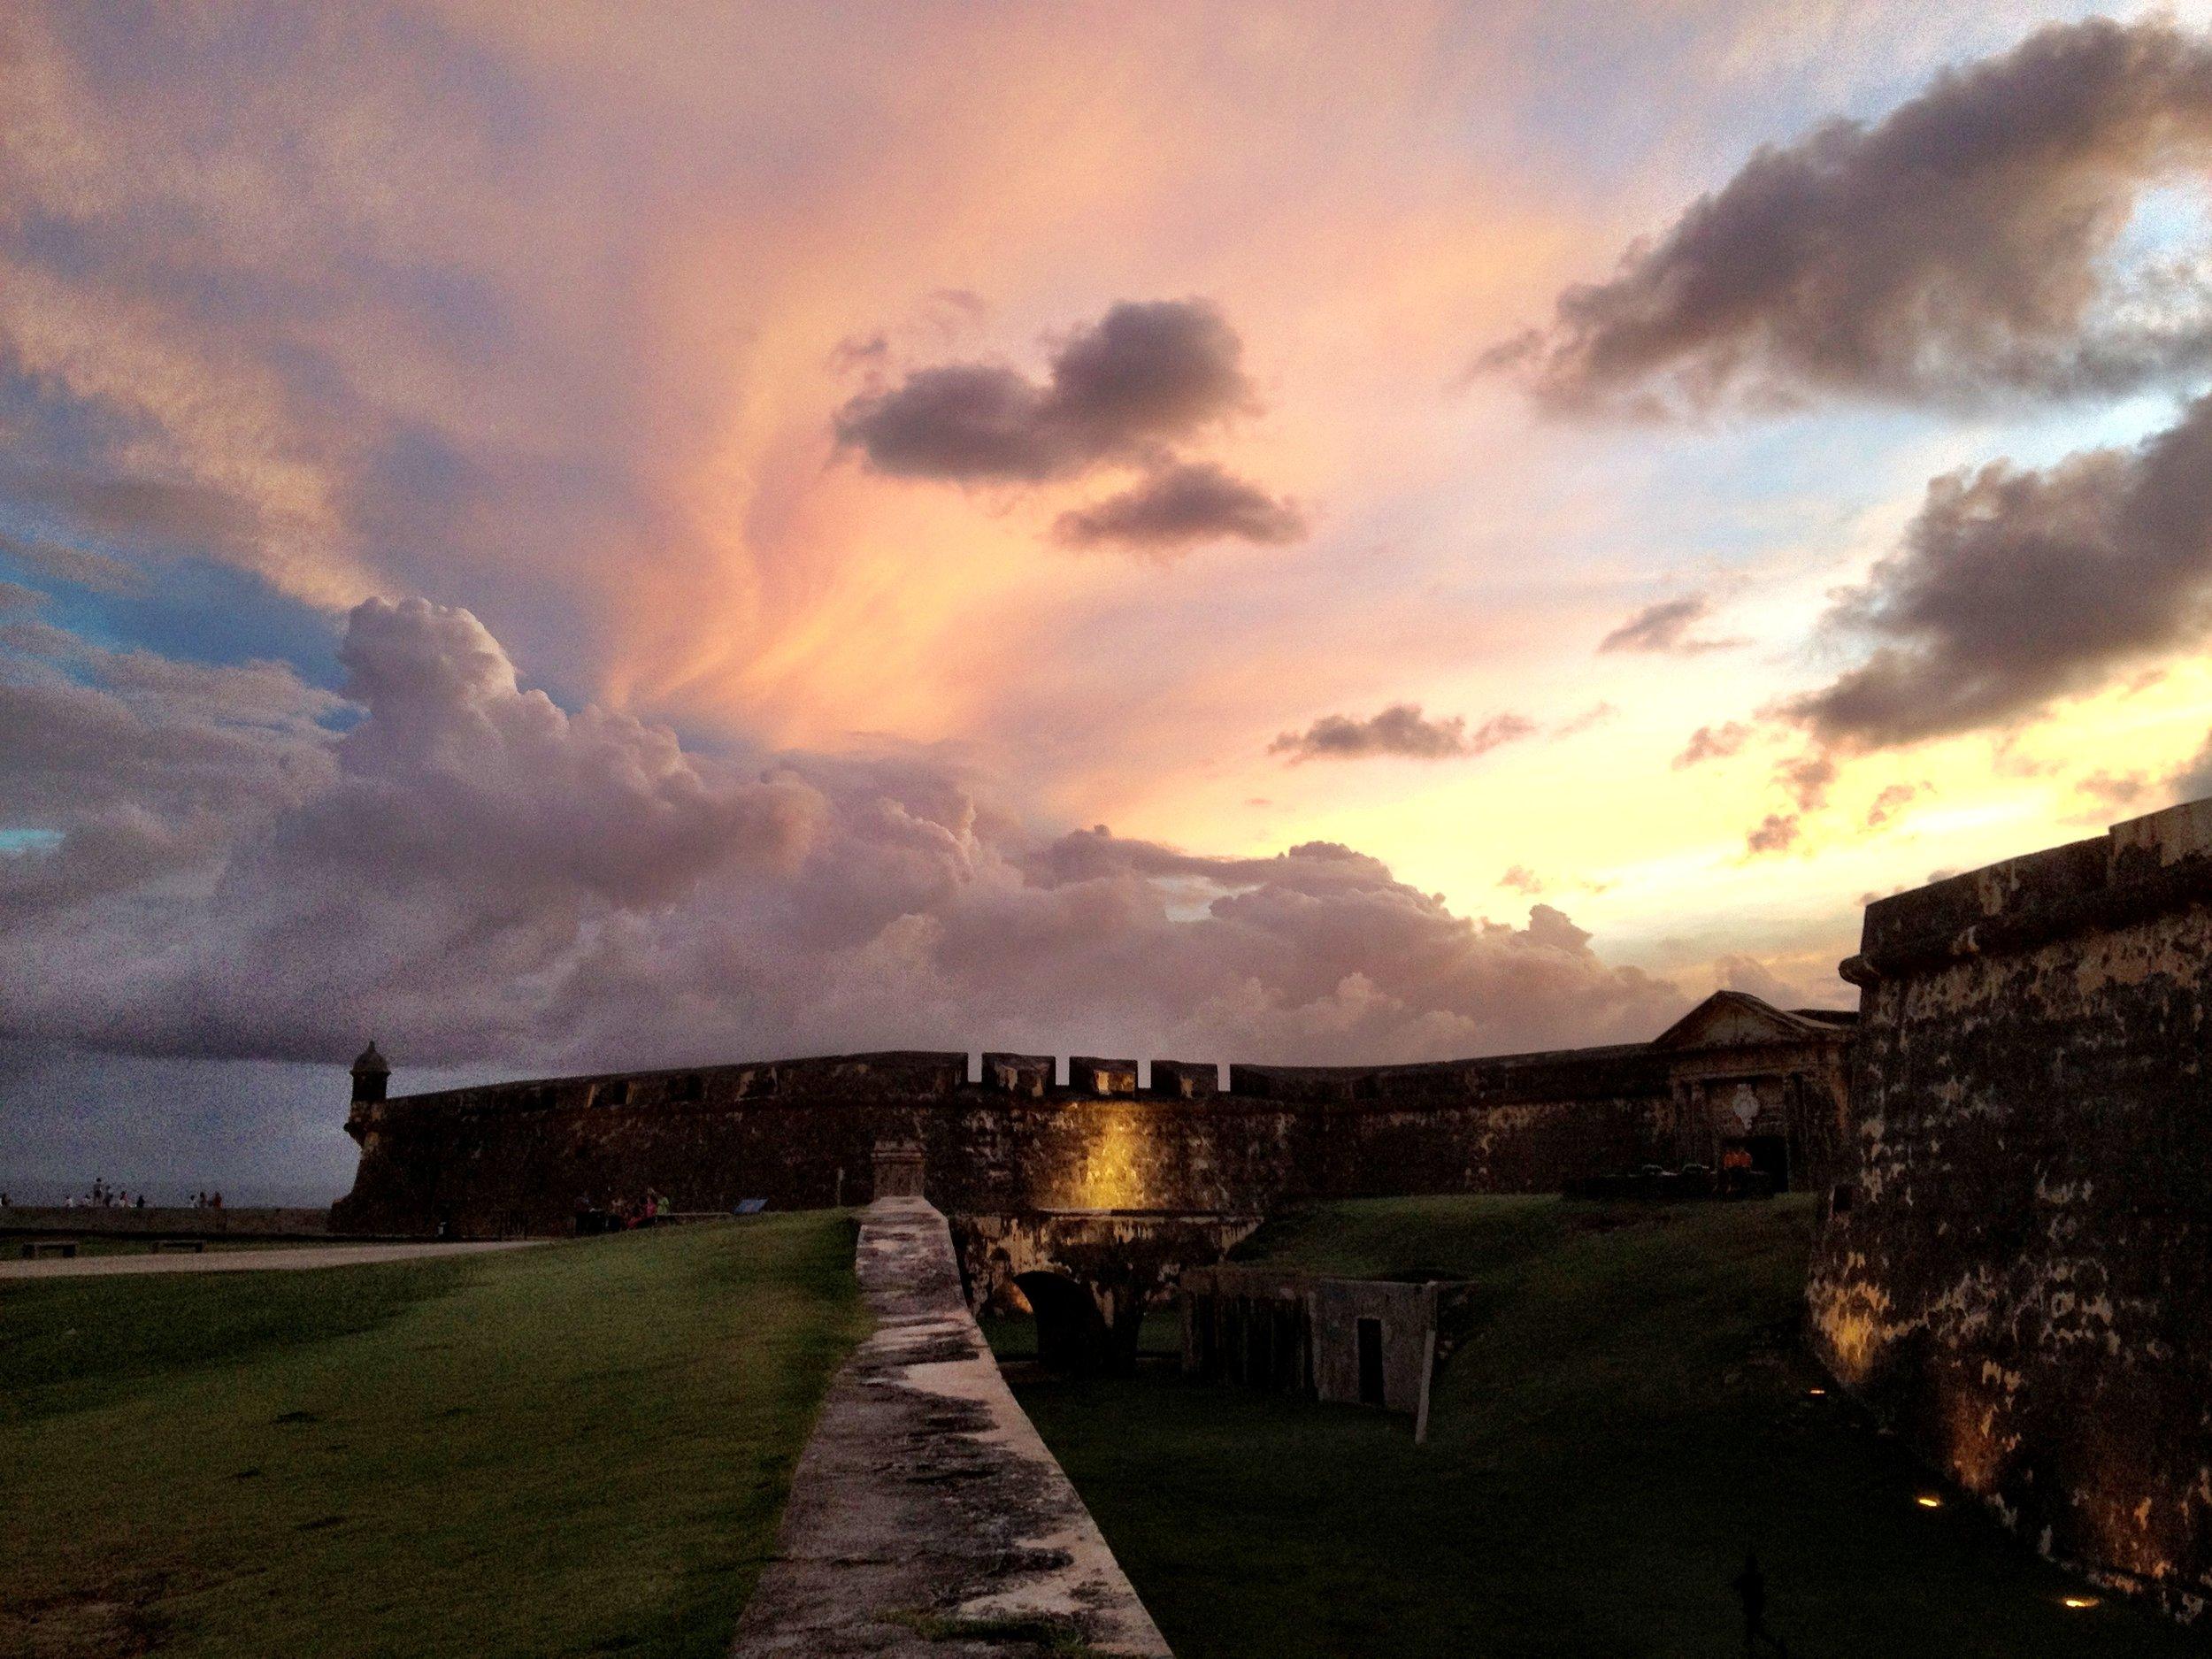 El Castillo San Felipe del Morro, San Juan, Puerto Rico (2011)